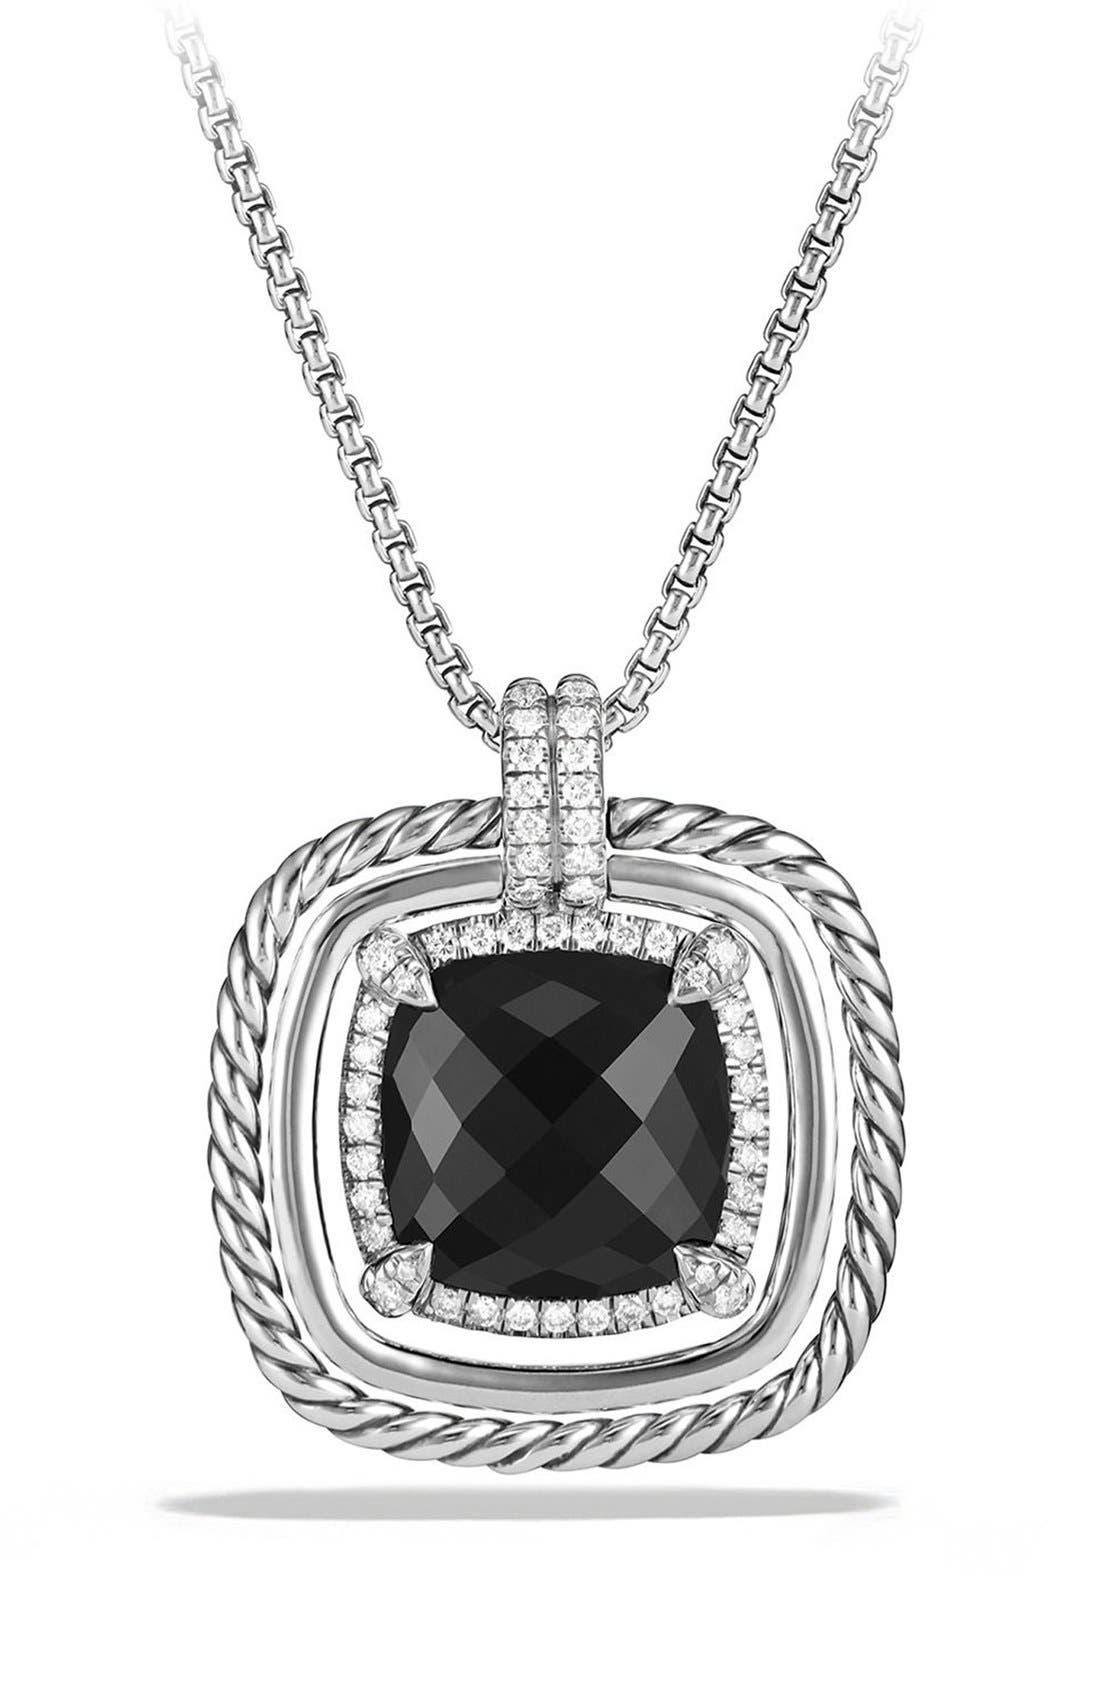 Main Image - David Yurman 'Châtelaine' Large Pavé Bezel Pendant Necklace with Diamonds